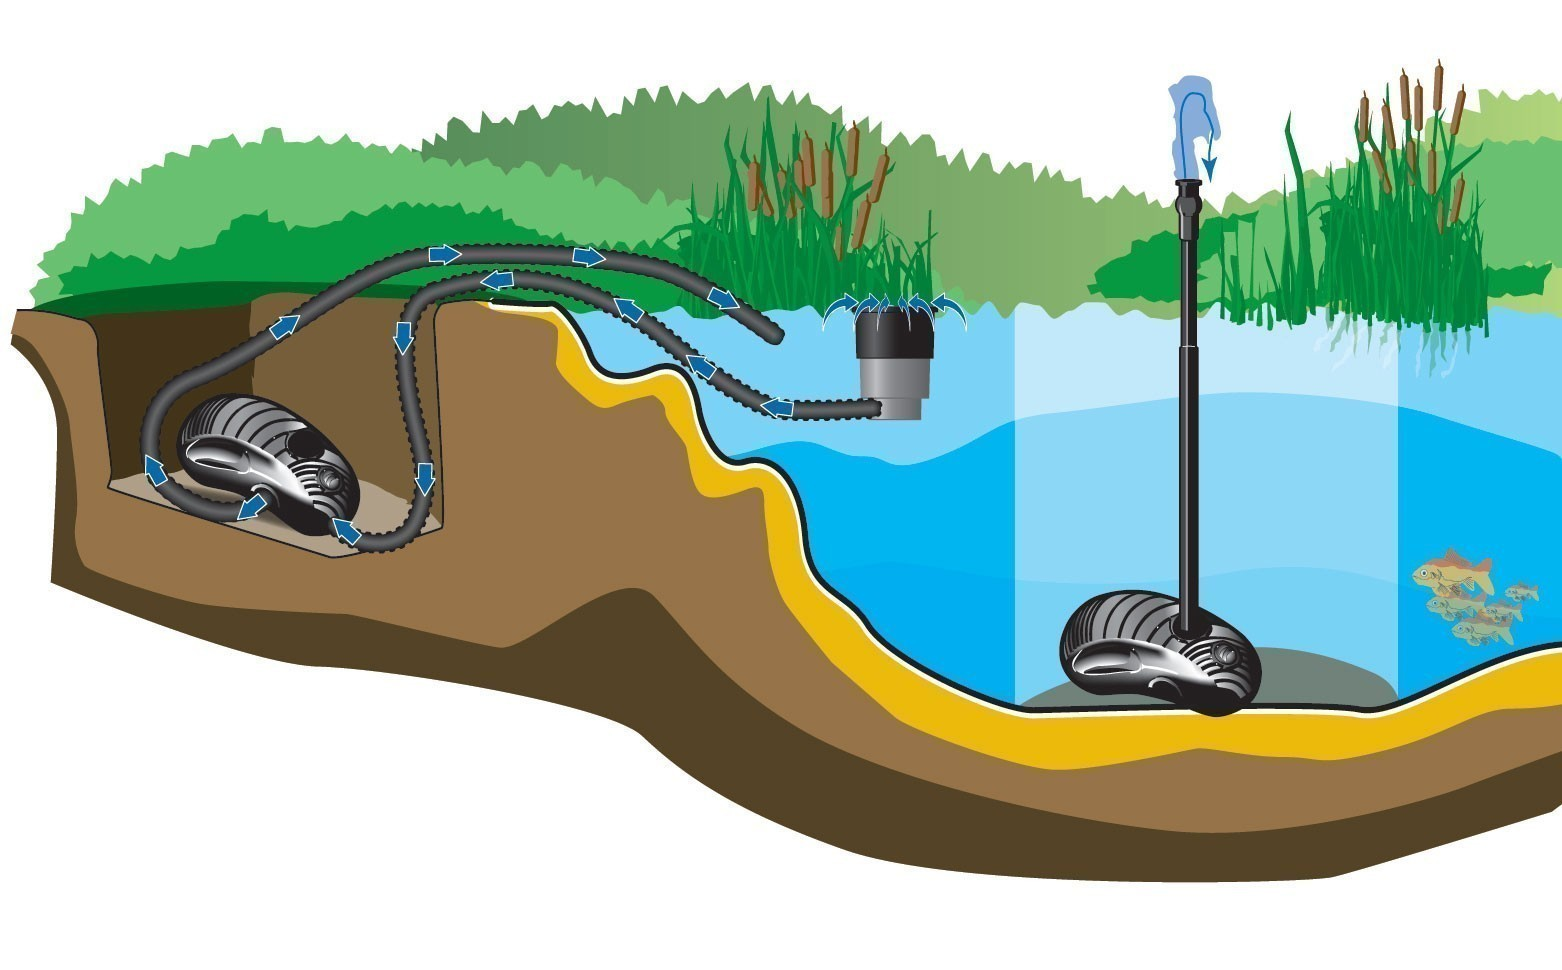 Filterpumpe Bachlaufpumpe Heissner Aqua Craft ECO P 2100E-00 Bild 3